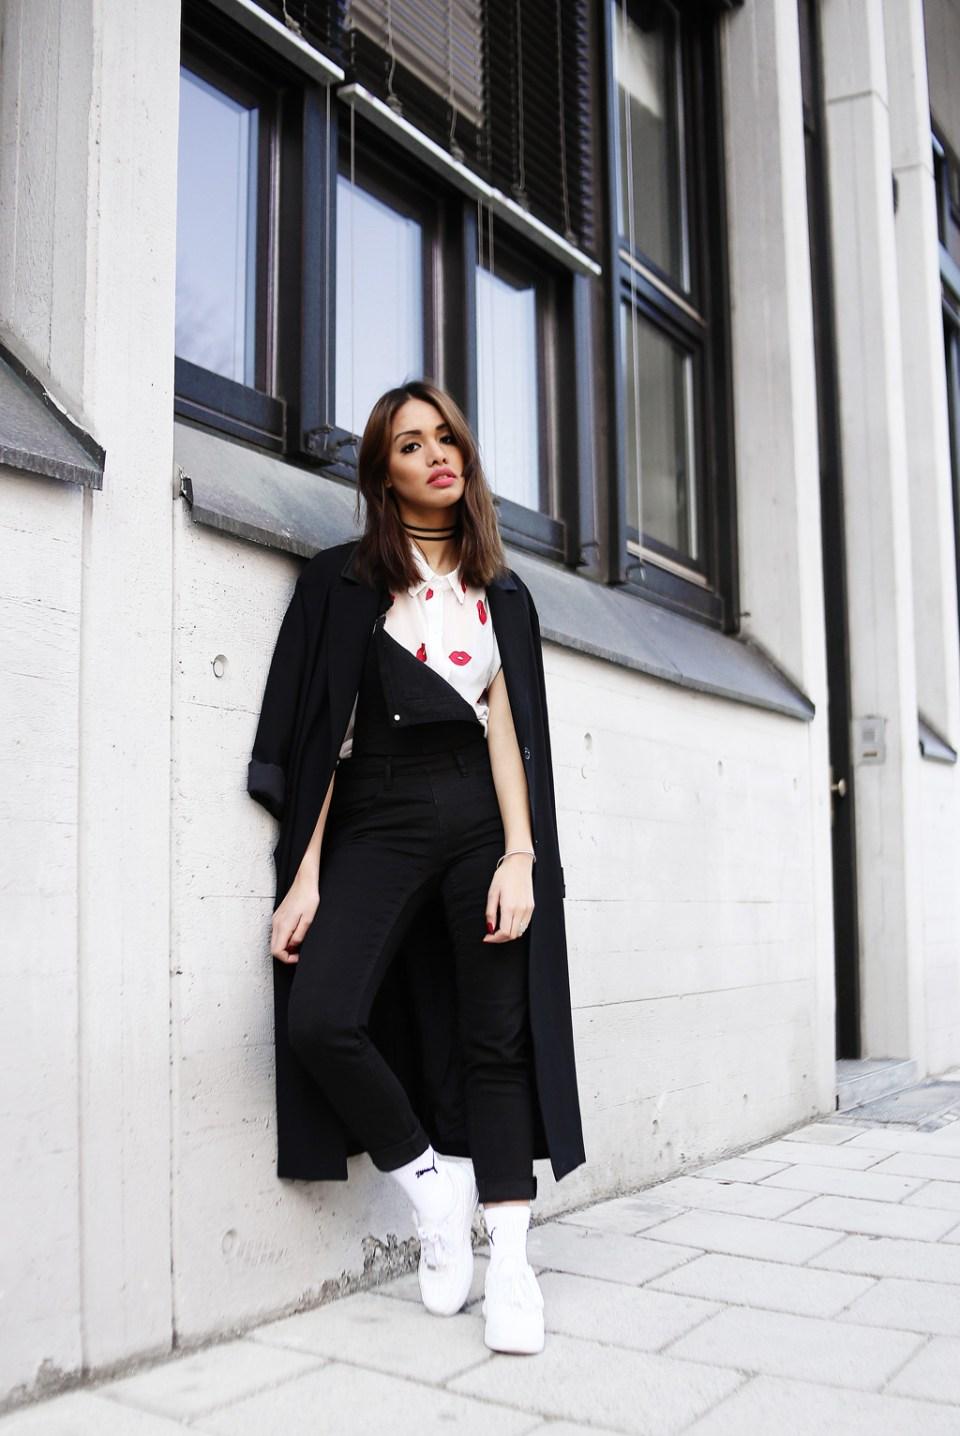 thefashionanarchy_dianabuenger_details_mollybracken_cheapmonday_black_schwarz_latzhose_blogger_style_outfit_munich_fashionblog_modeblog_styleblog_kiss_print_2